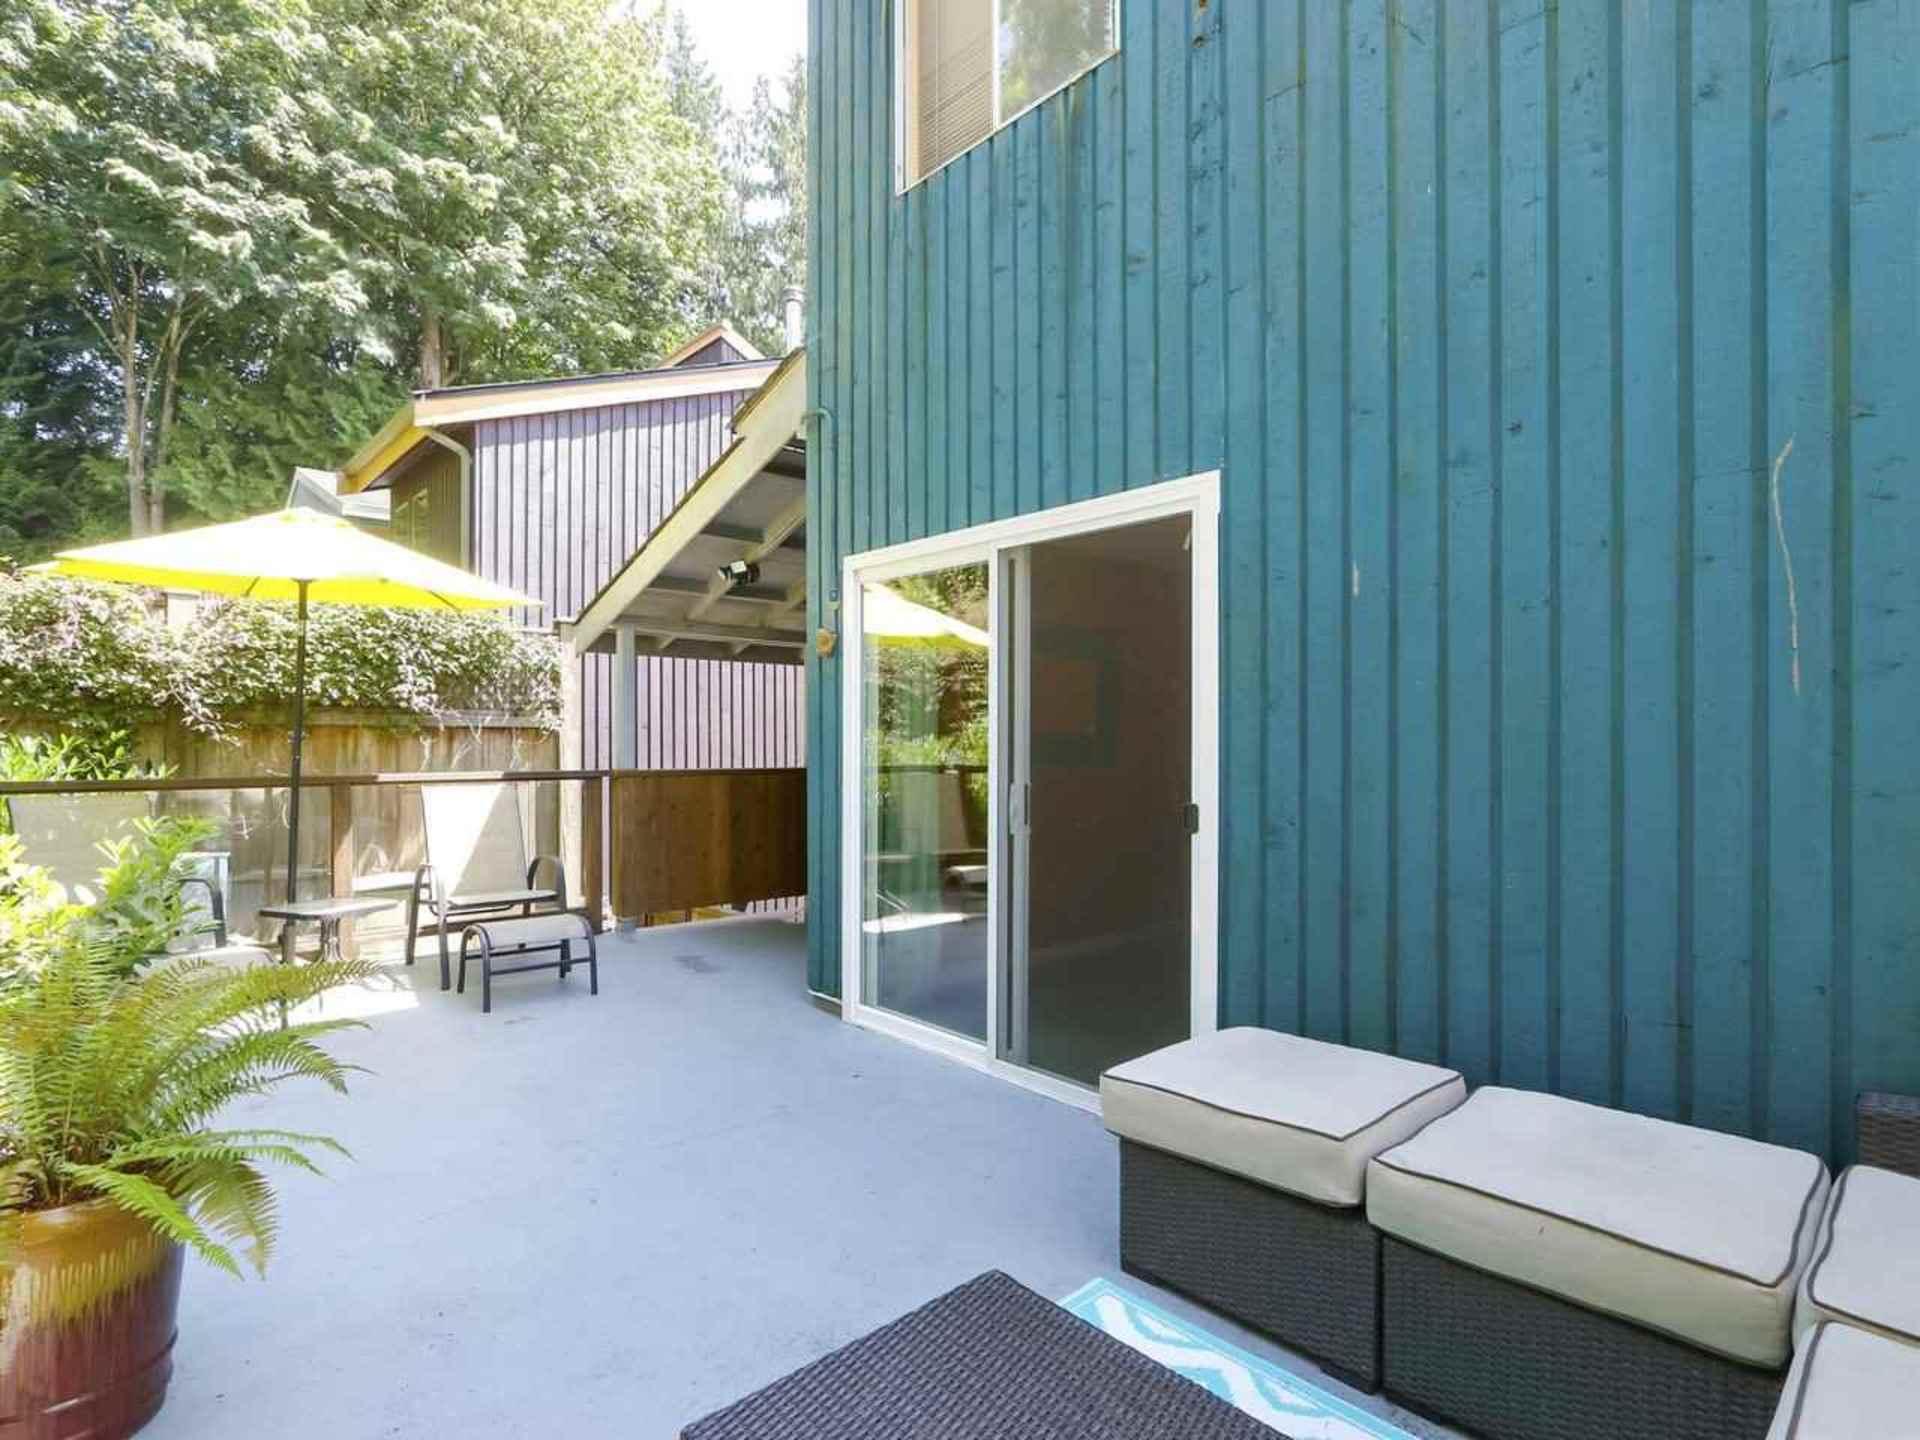 1682-w-21st-street-pemberton-nv-north-vancouver-18 at 1682 W 21st Street, Pemberton NV, North Vancouver